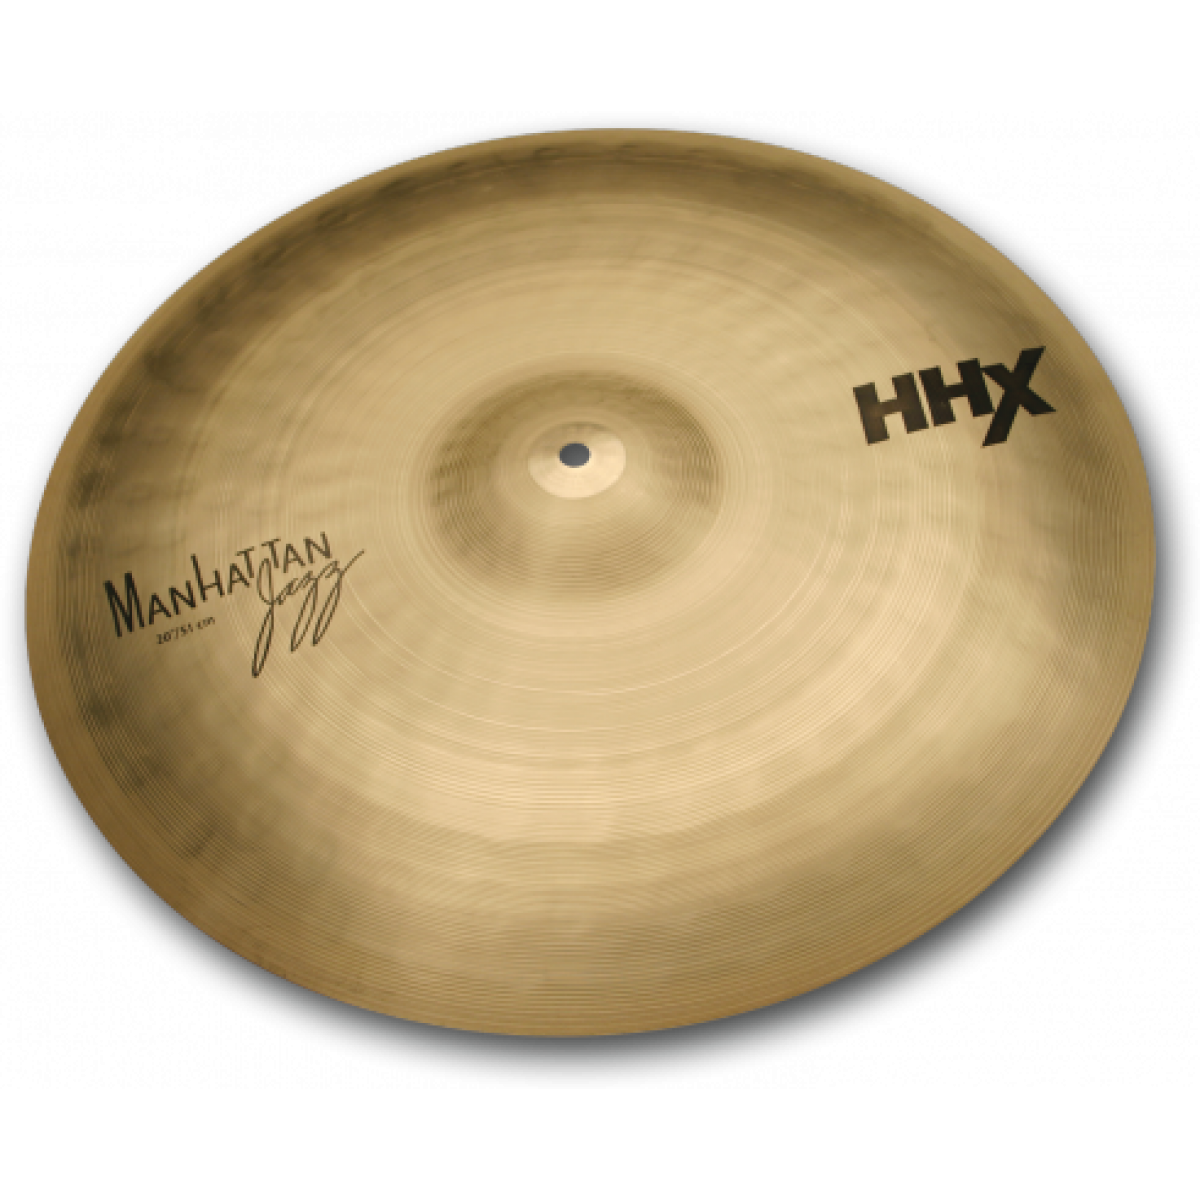 sabian hhx 22 manhattan jazz ride cymbal natural finish. Black Bedroom Furniture Sets. Home Design Ideas